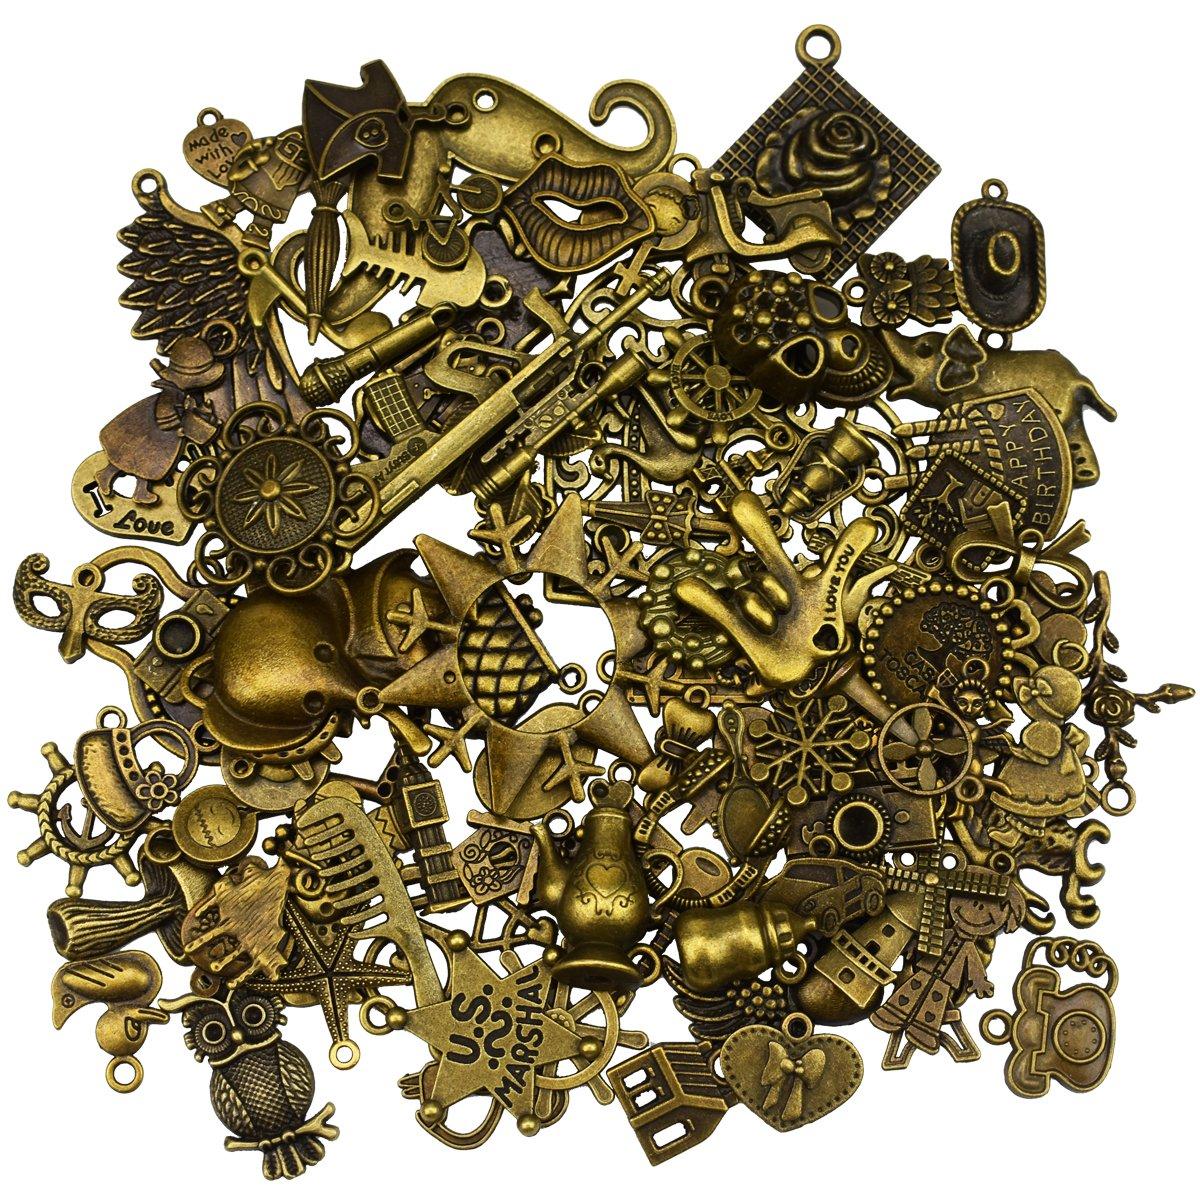 24Pcs Large Antique Bronze Skeleton Keys Rustic Key for Wedding Decoration Favor, Necklace Pendants, Jewelry Making XONOR